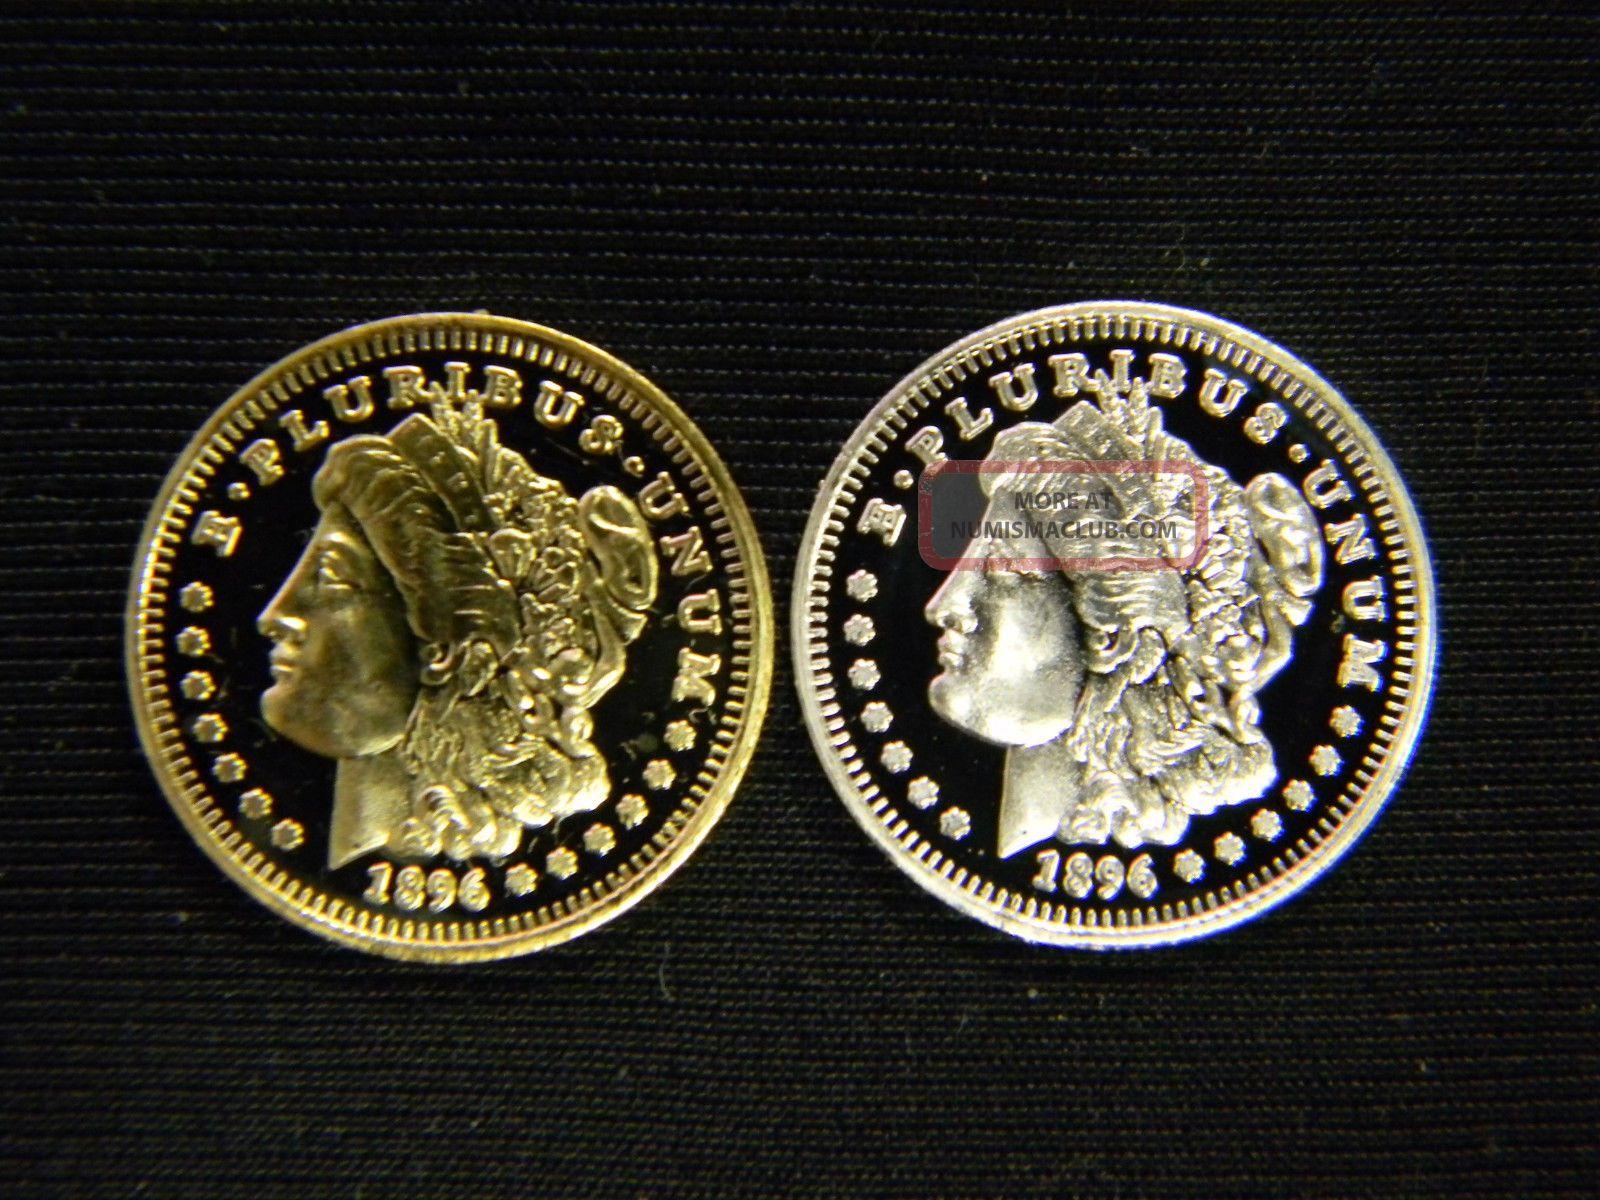 Two (2) 1 Gram Pure 999 Fine Solid Silver + 24k Gold Morgan Dollar Bullion Rnd Silver photo